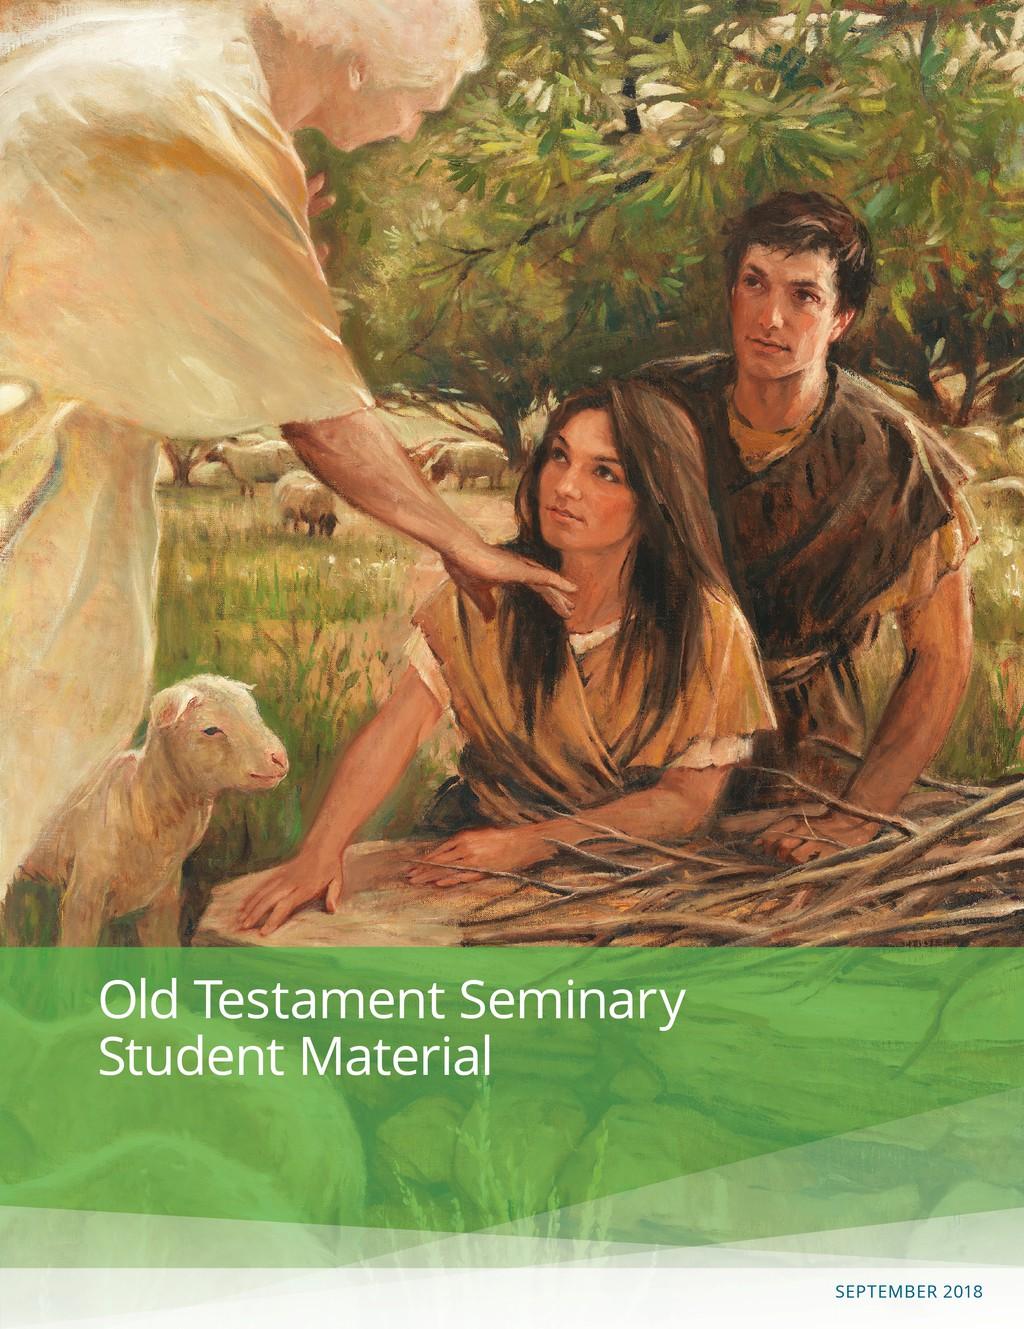 Old testament seminary teacher manual deseret book.